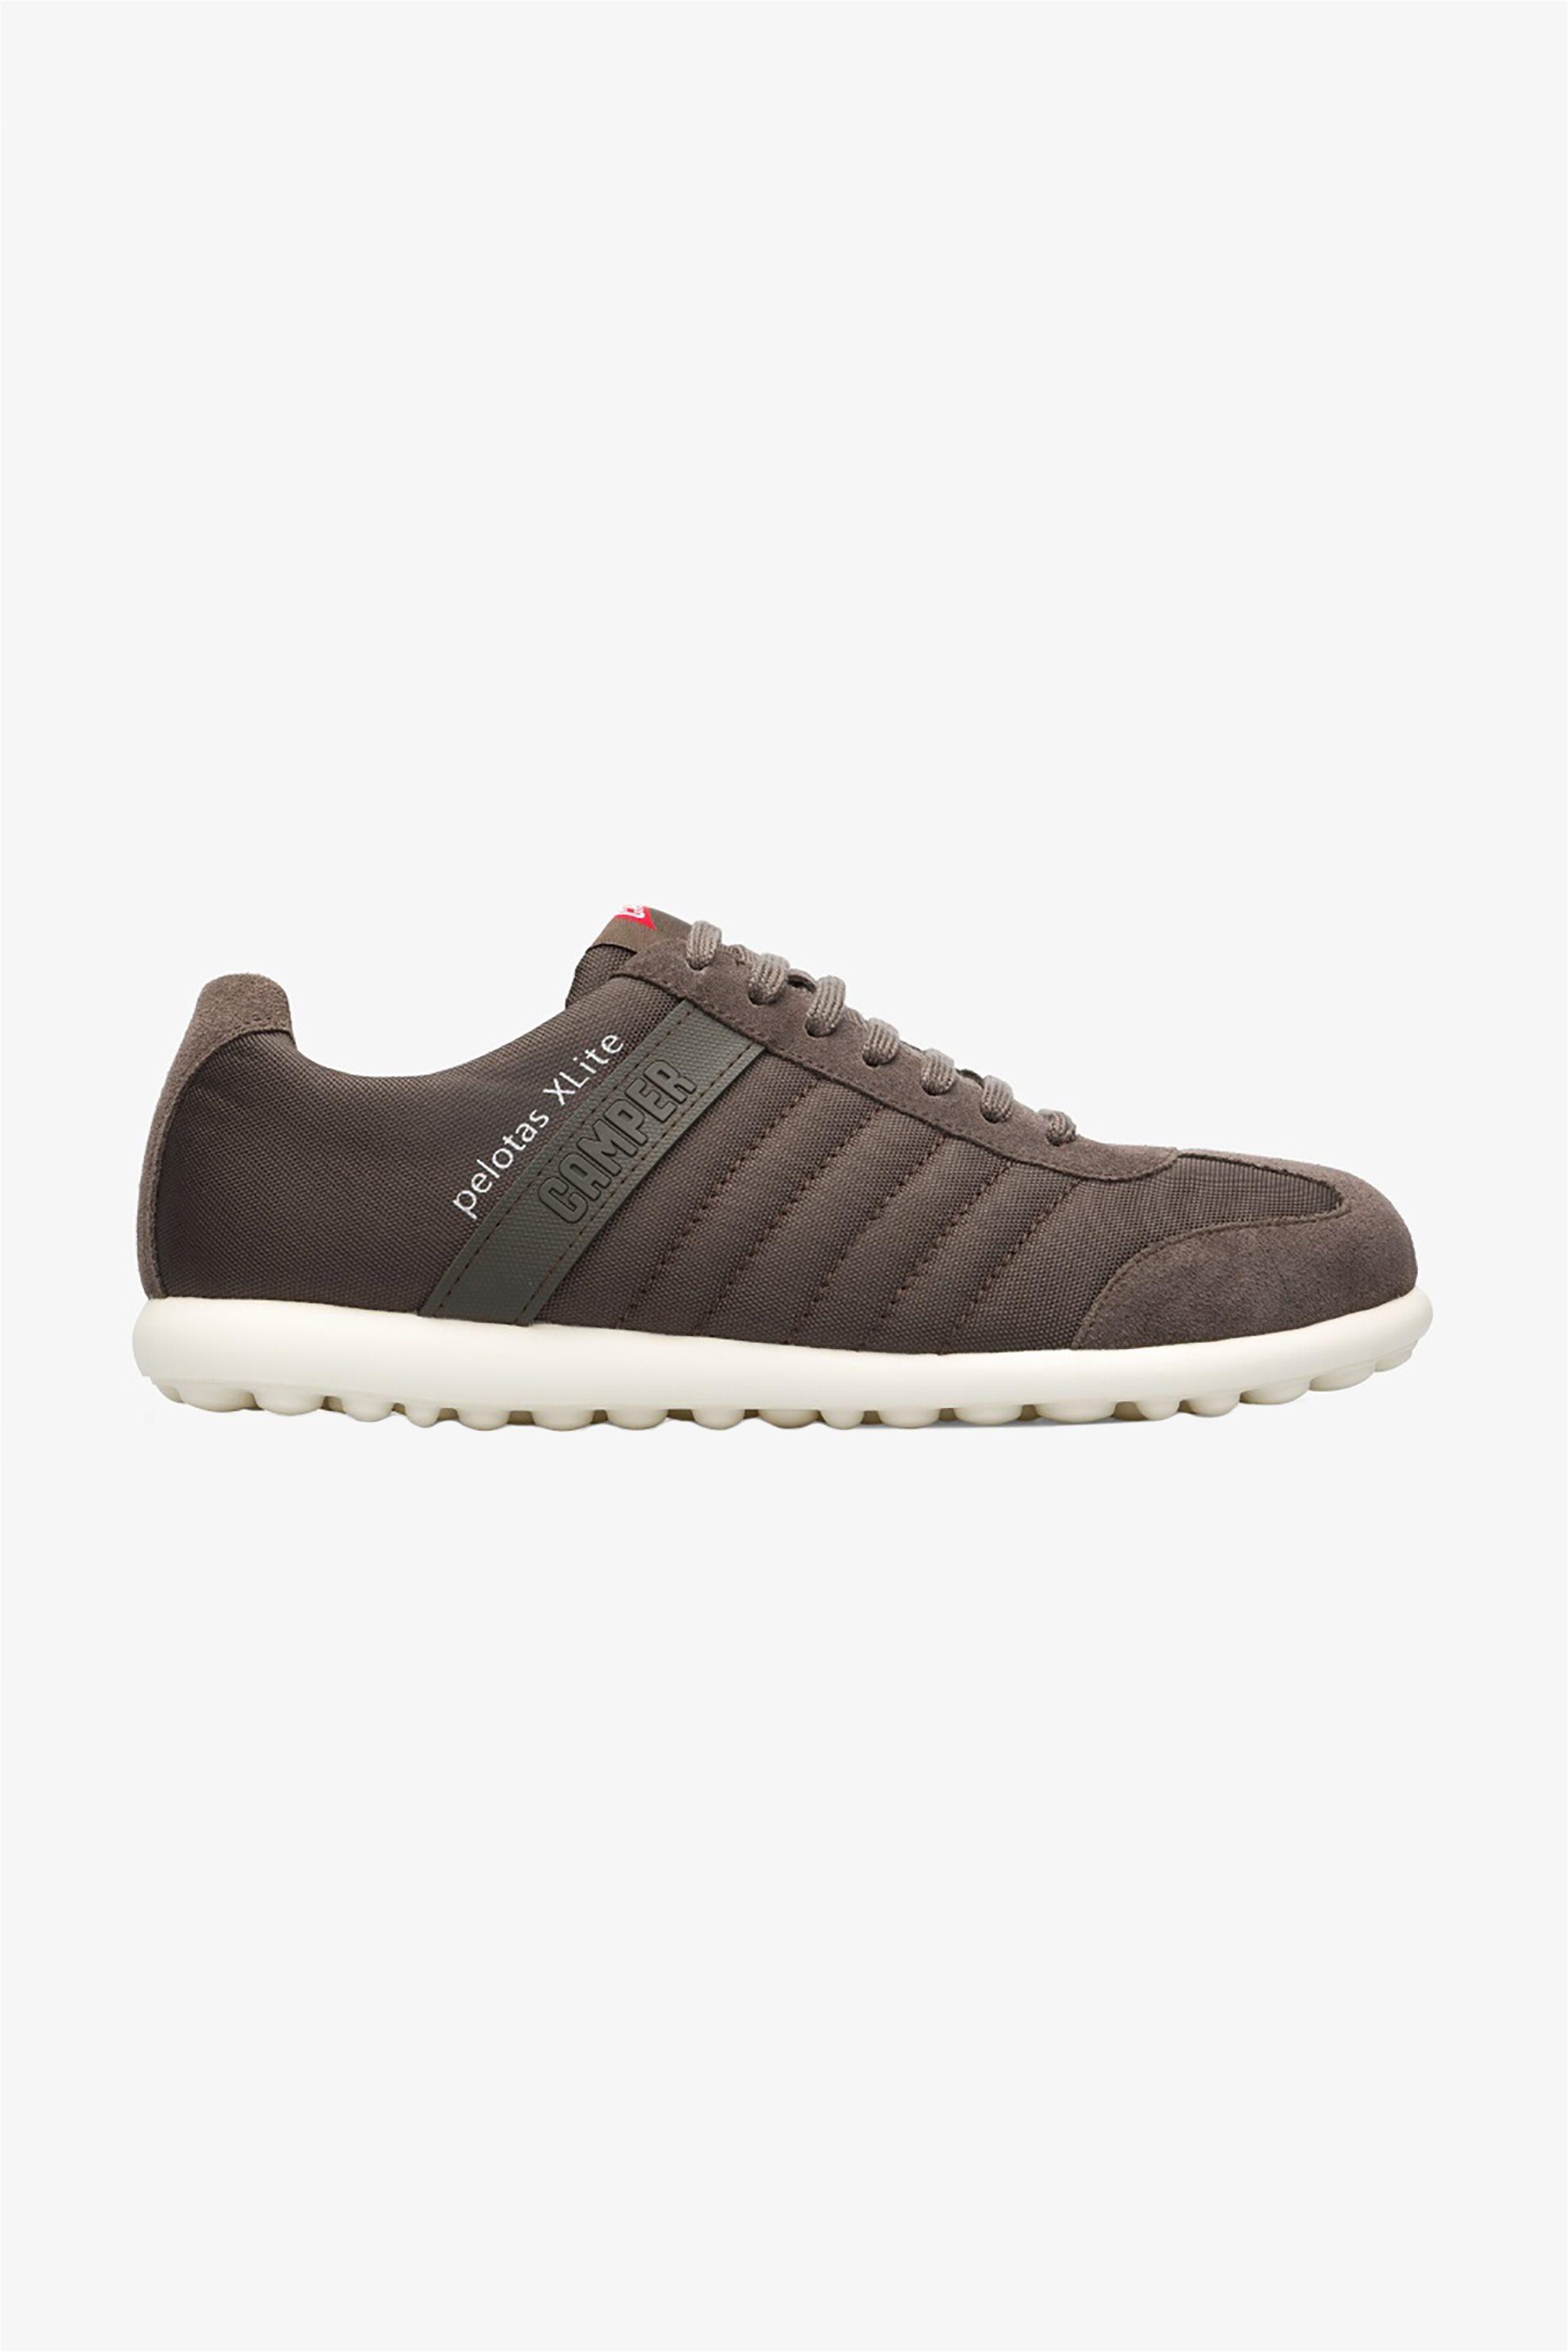 "Camper ανδρικά δερμάτινα sneakers ""Pelotas XLite"" – 18302-124 – Γκρι"